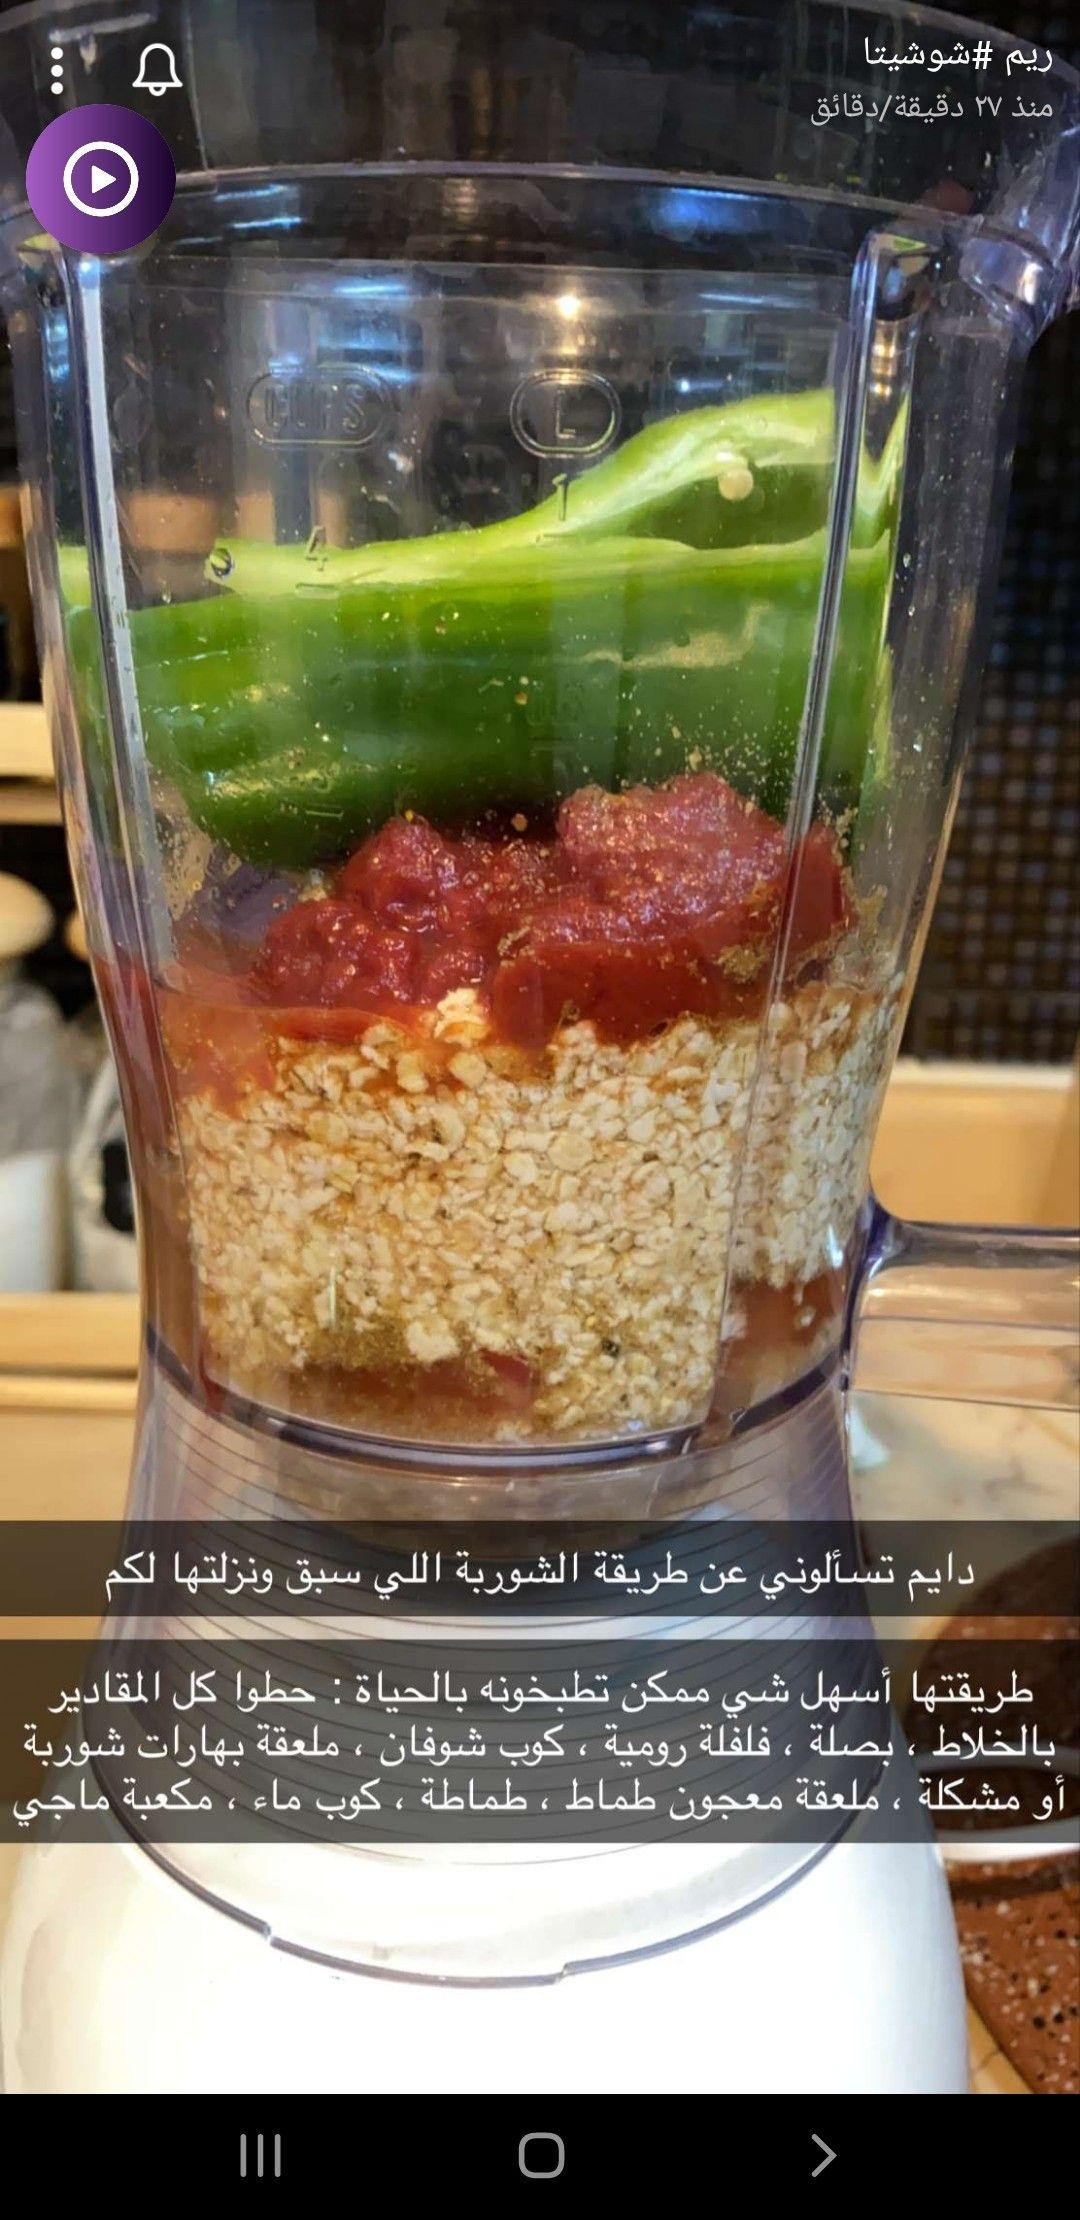 Pin By Takoya Qata On A Cook Diy Food Recipes Food Receipes Food Garnishes